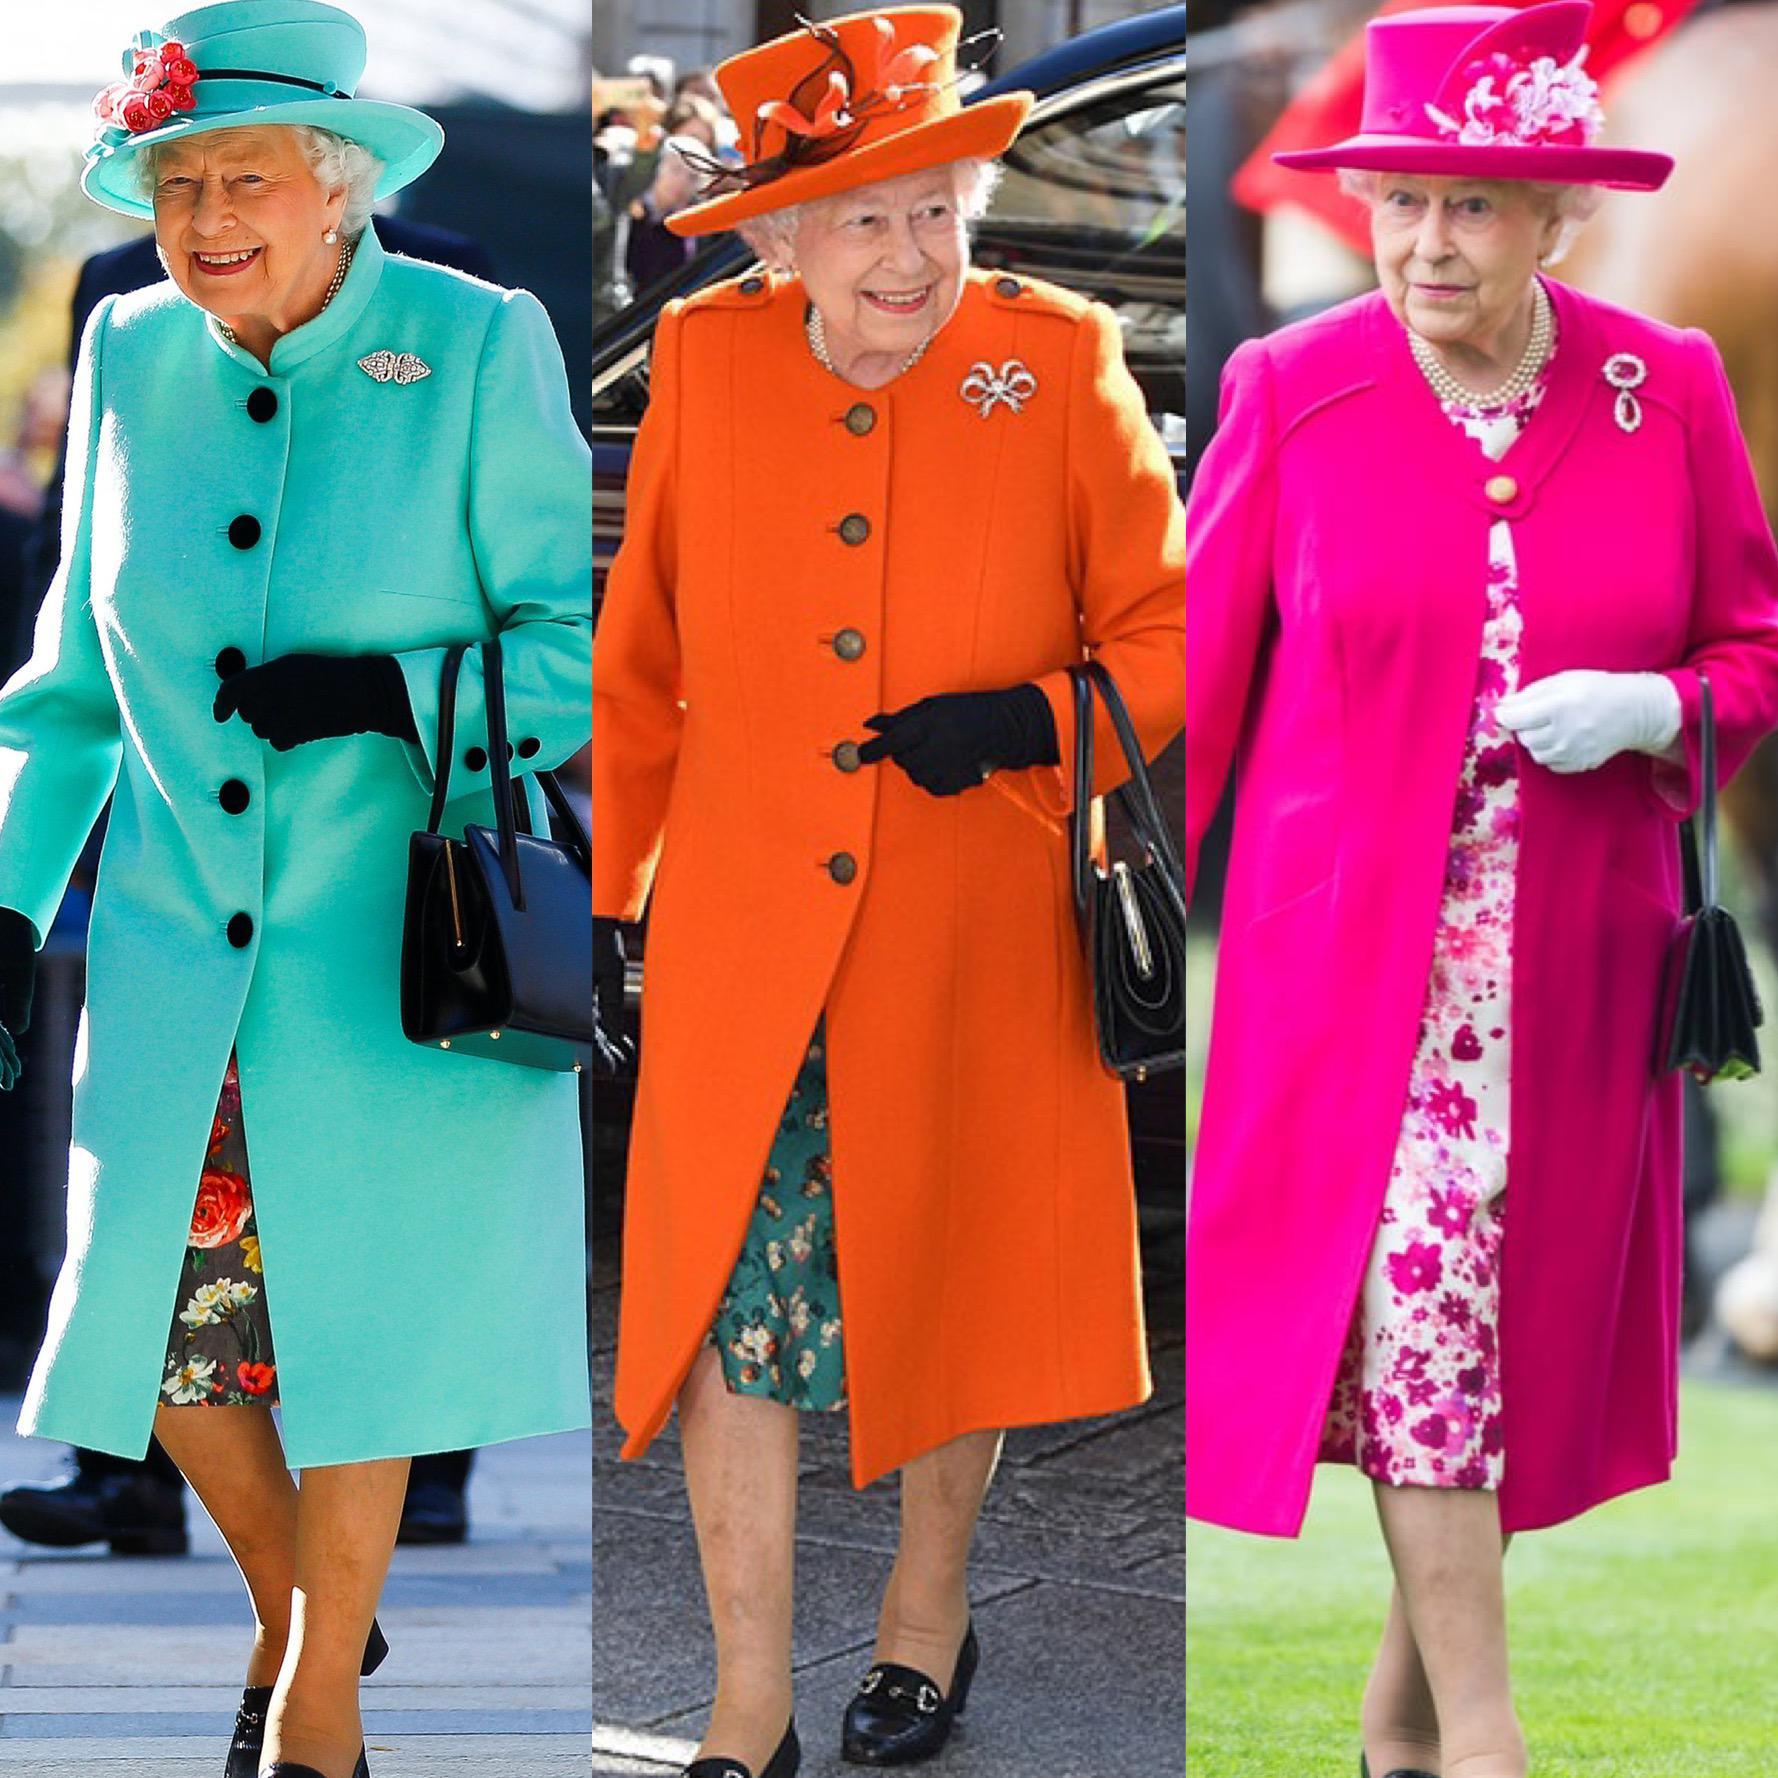 Rainha Isabel II vai excluir o uso de peles de animais do seu guarda-fato!